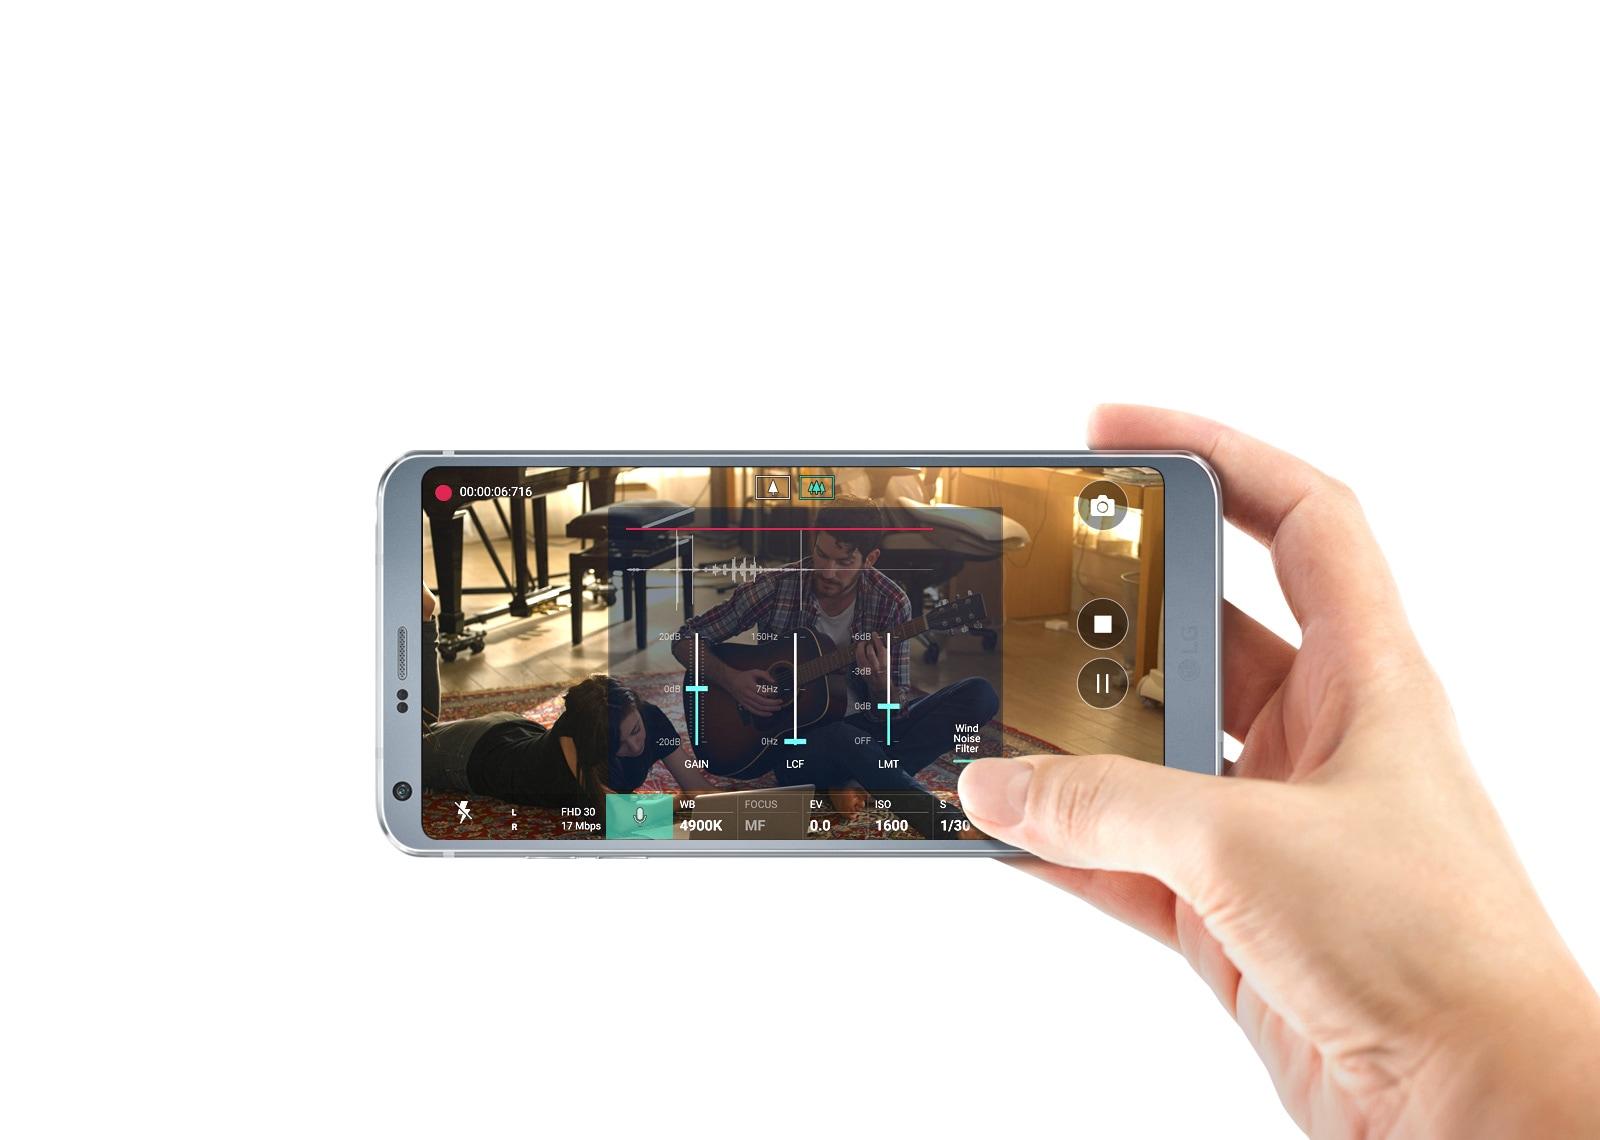 Lg G6 H870ds Black 64gb Mobile Phone Hk Cellphone Detector Circuit Youtube 08 Hi Fi Recording